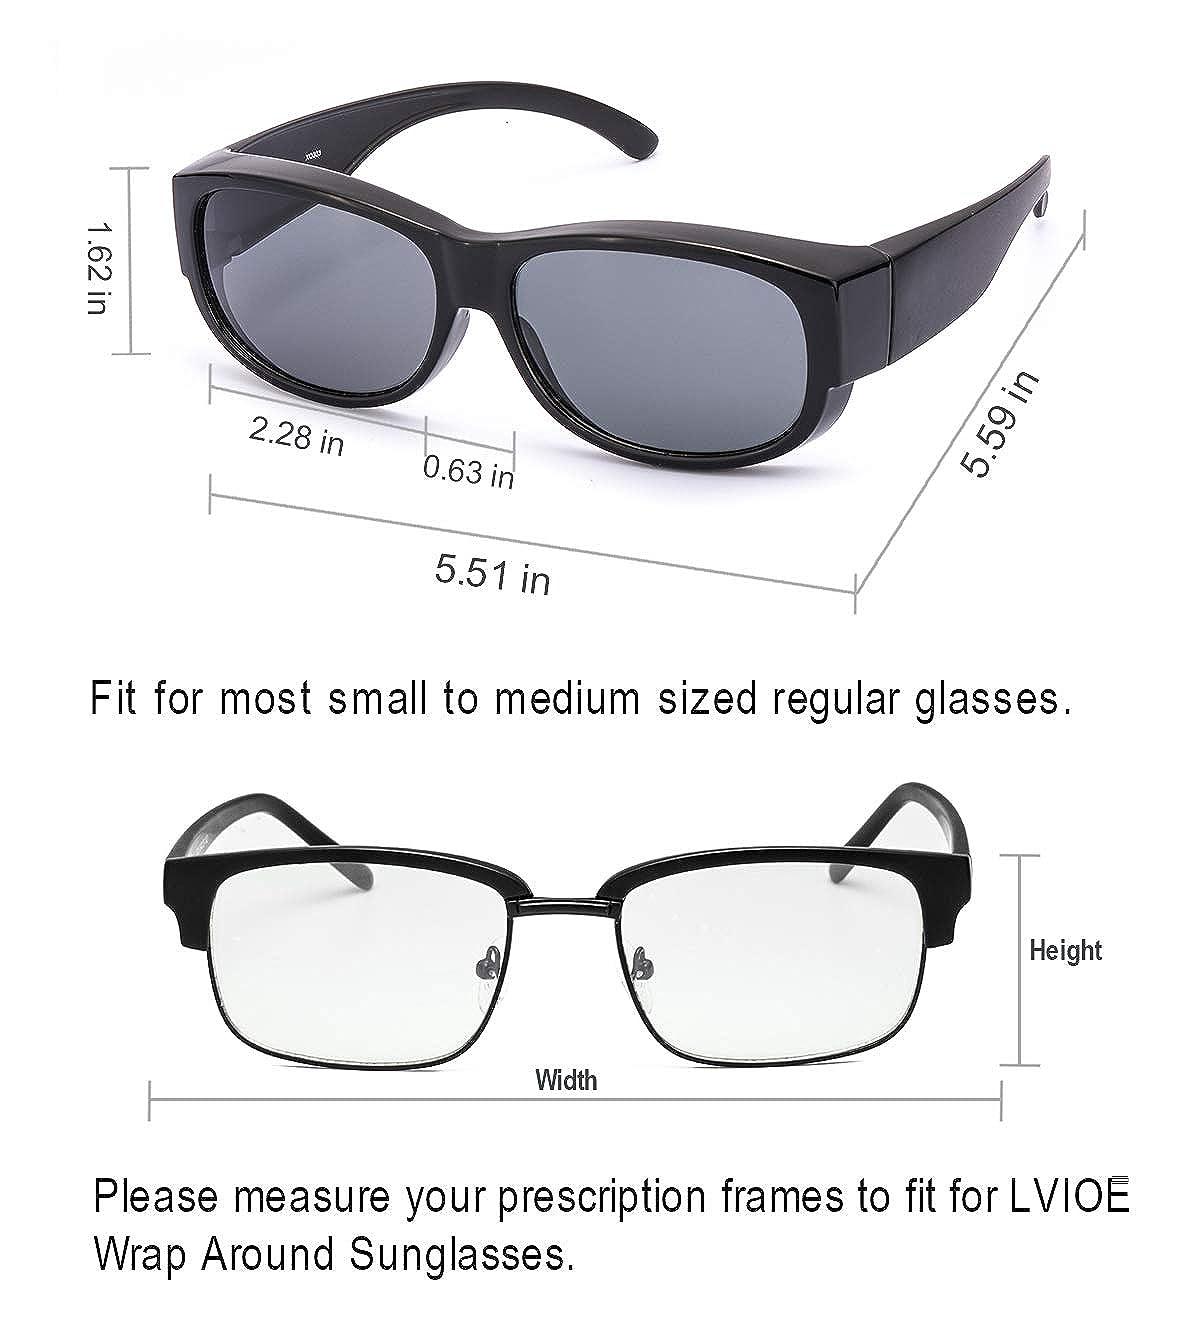 f87f4de0ad2 Amazon.com  LVIOE Fit Over Glasses Sunglasses with Polarized Lenses